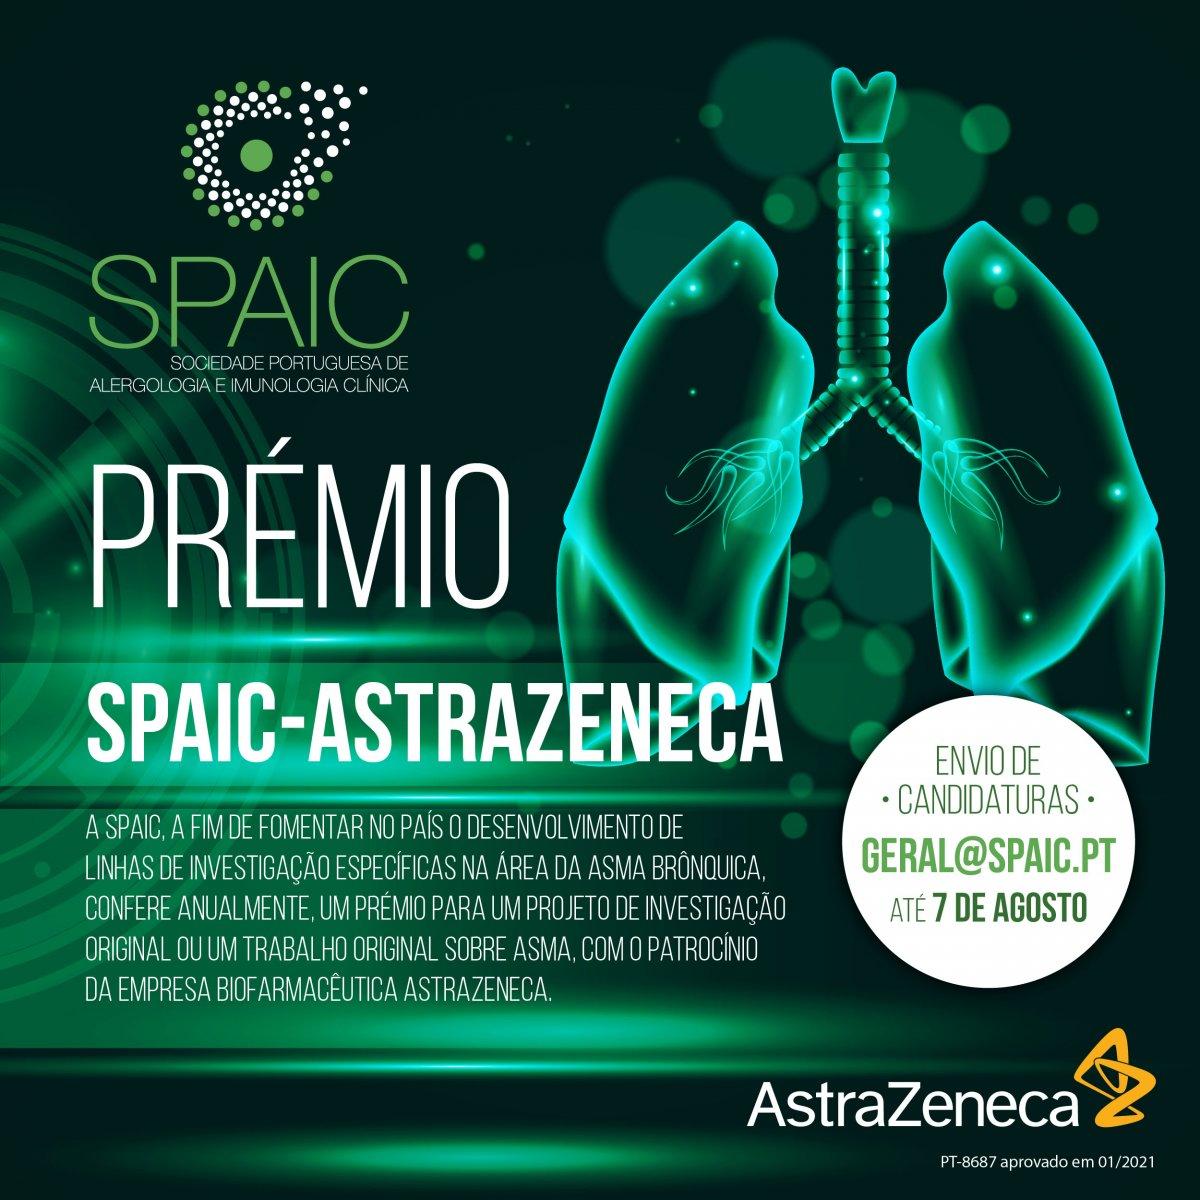 Prémio SPAIC-Astrazeneca